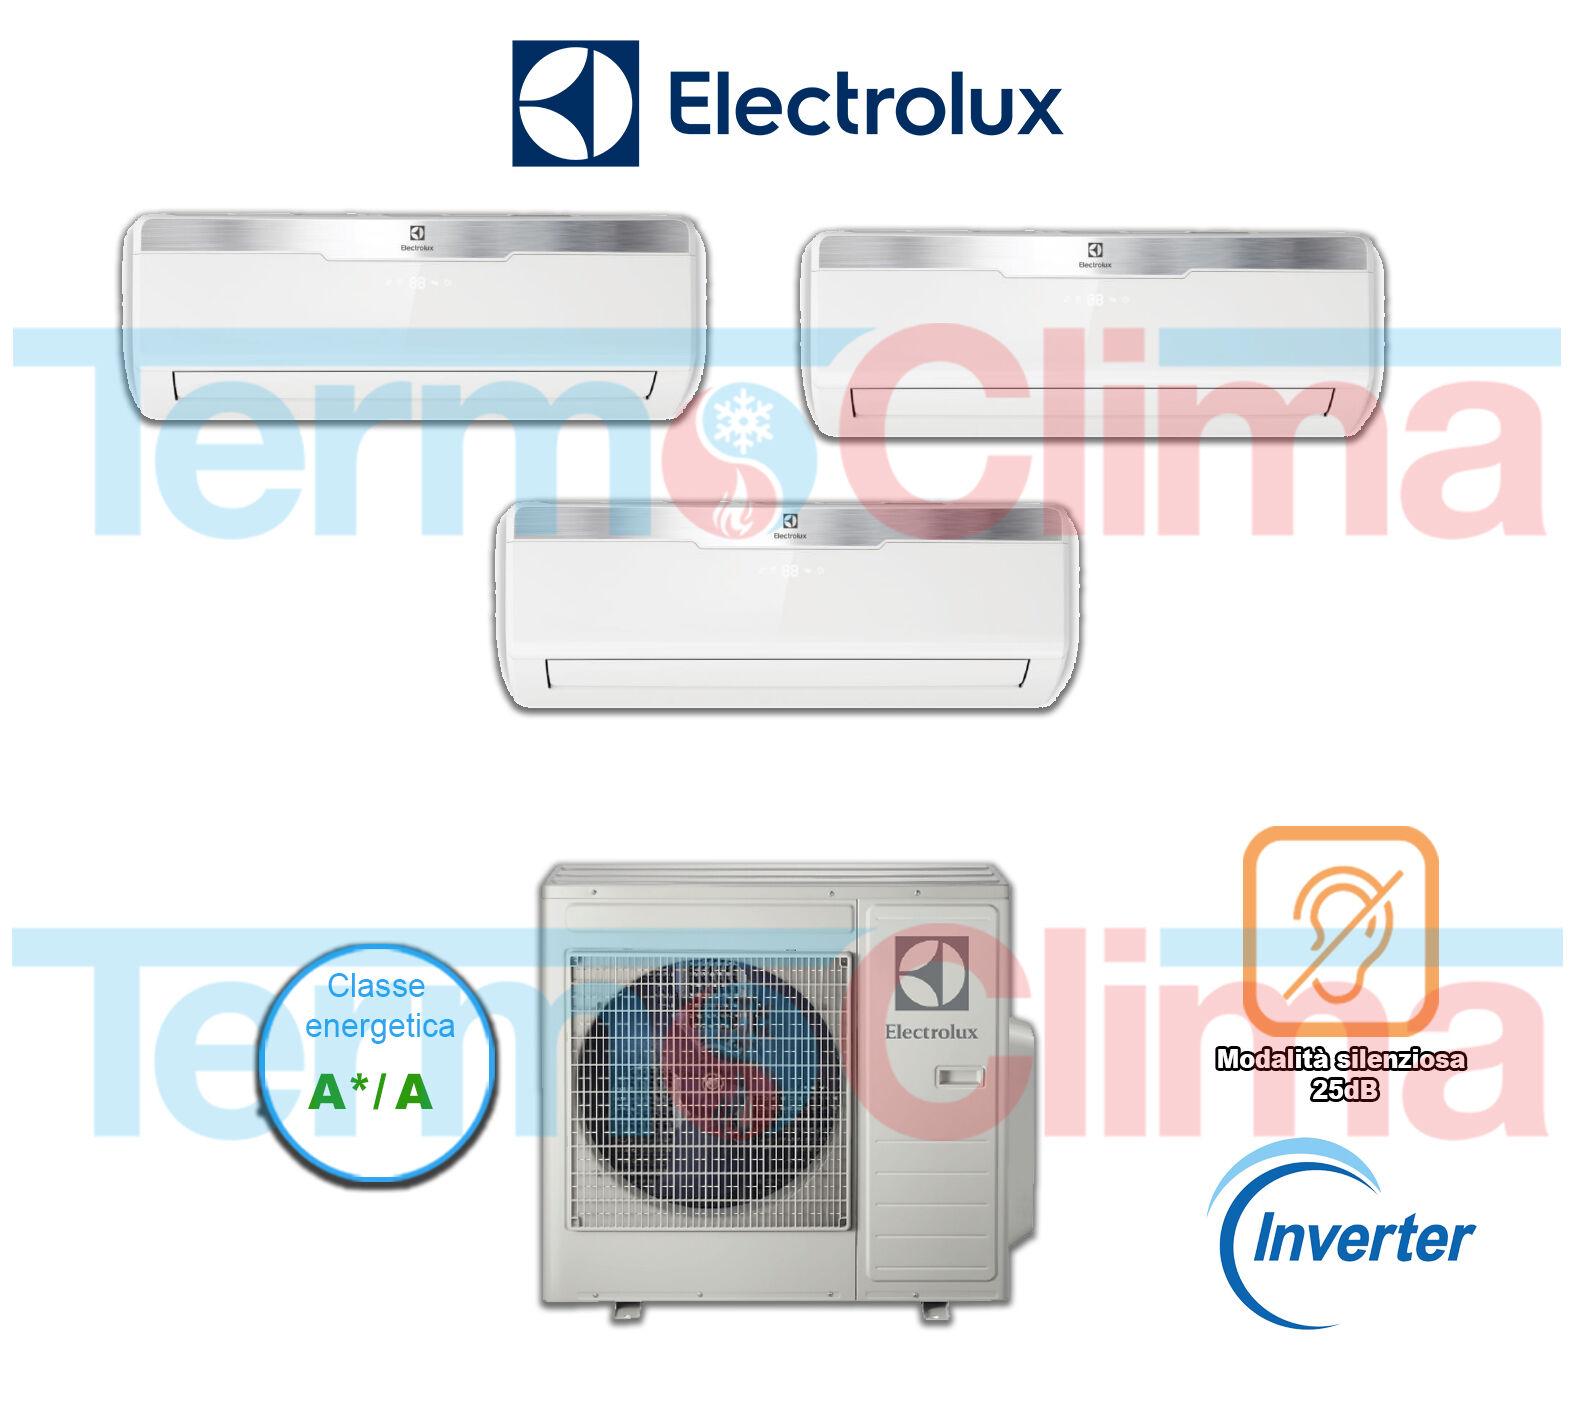 Climatizzatore Condizionatore Trial Split Trialsplit Exo42heiwe 9912 Inverter Electrolux 9000900012000 Btu Gas R410 A A Wifi Optional